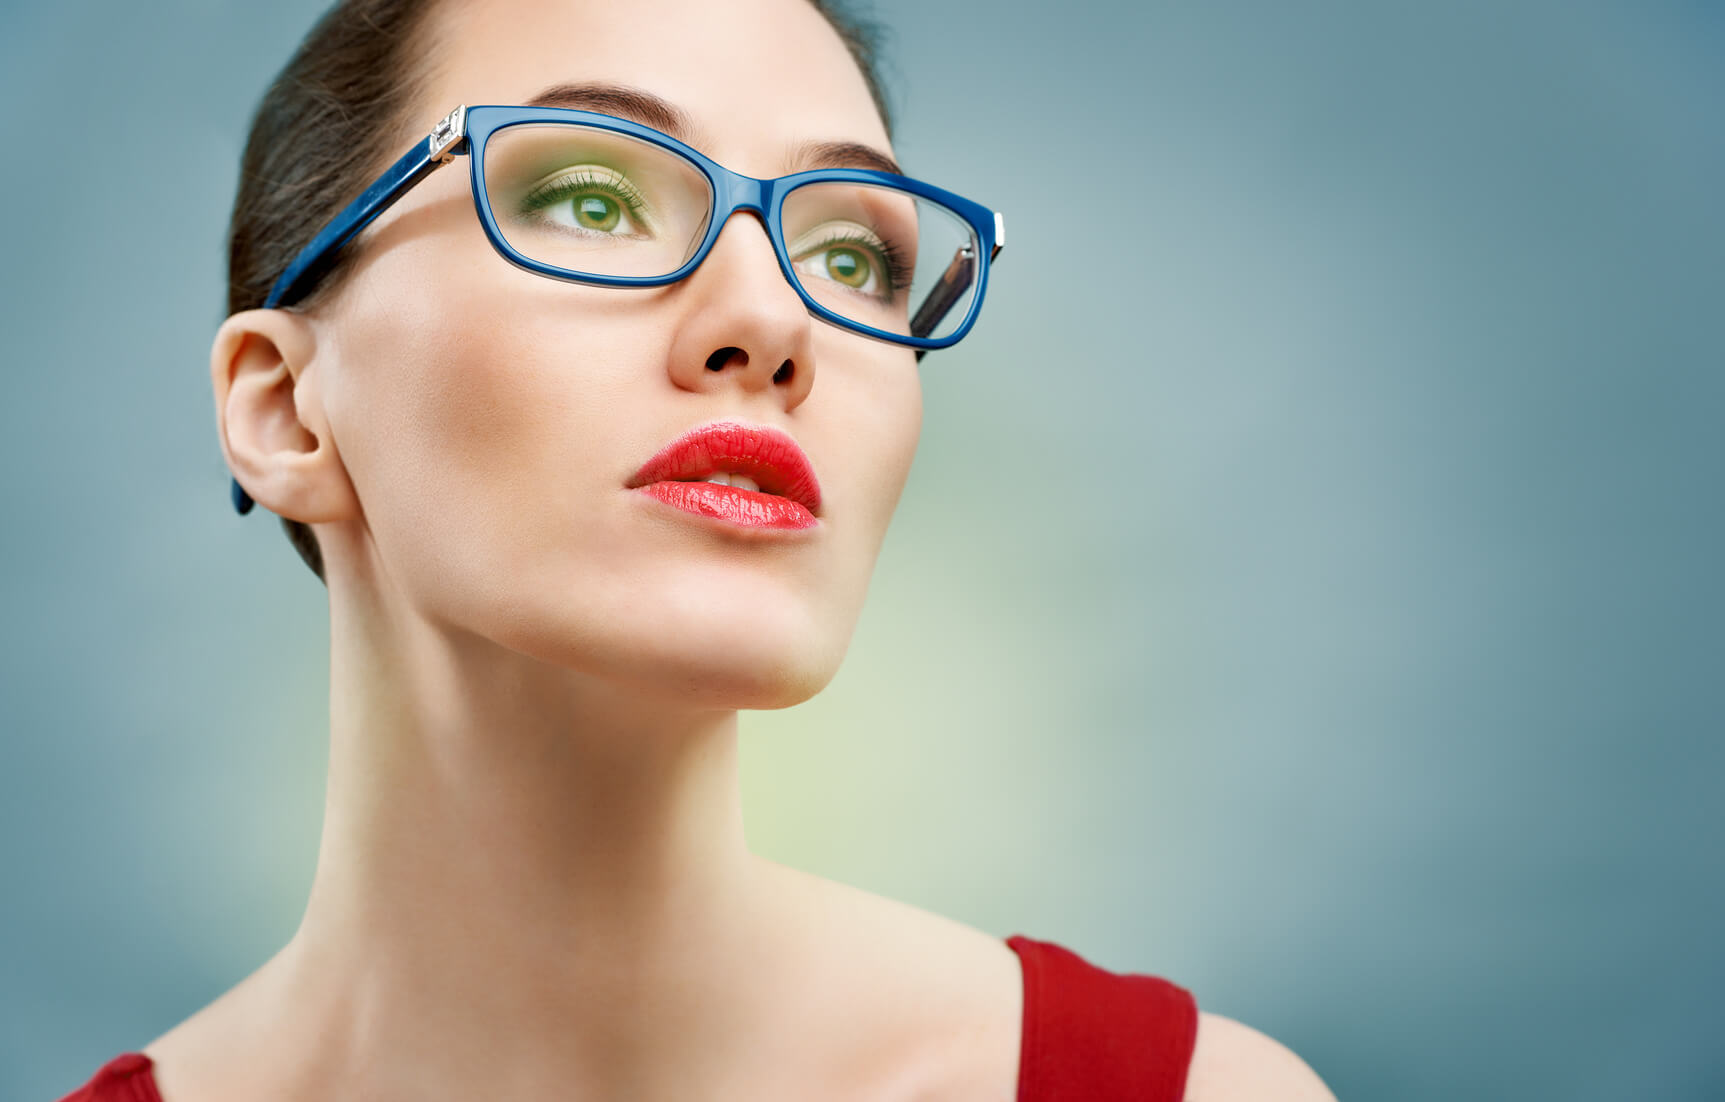 Optique Marmet Strasbourg : Montures, verres, lentilles et audio-prothèse – 1